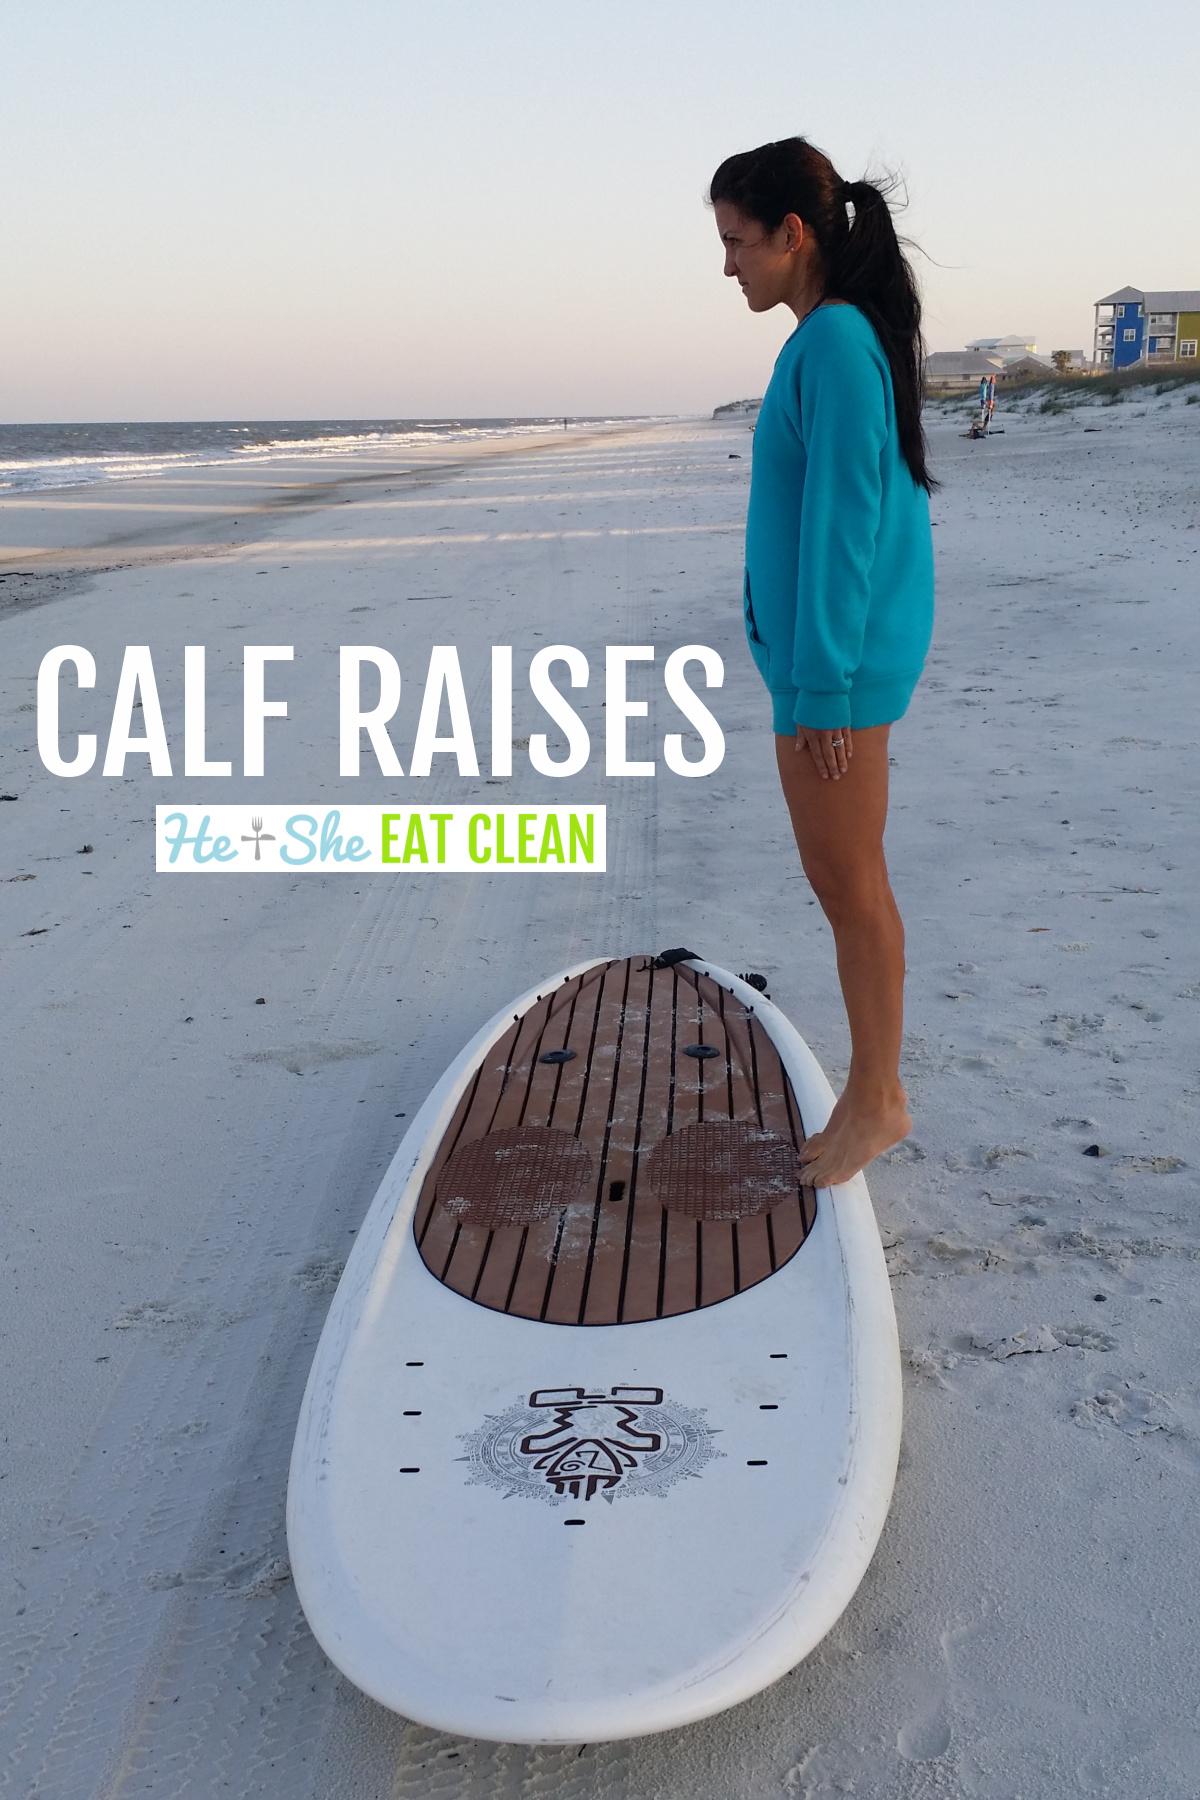 female doing calf raises on a paddleboard on the beach